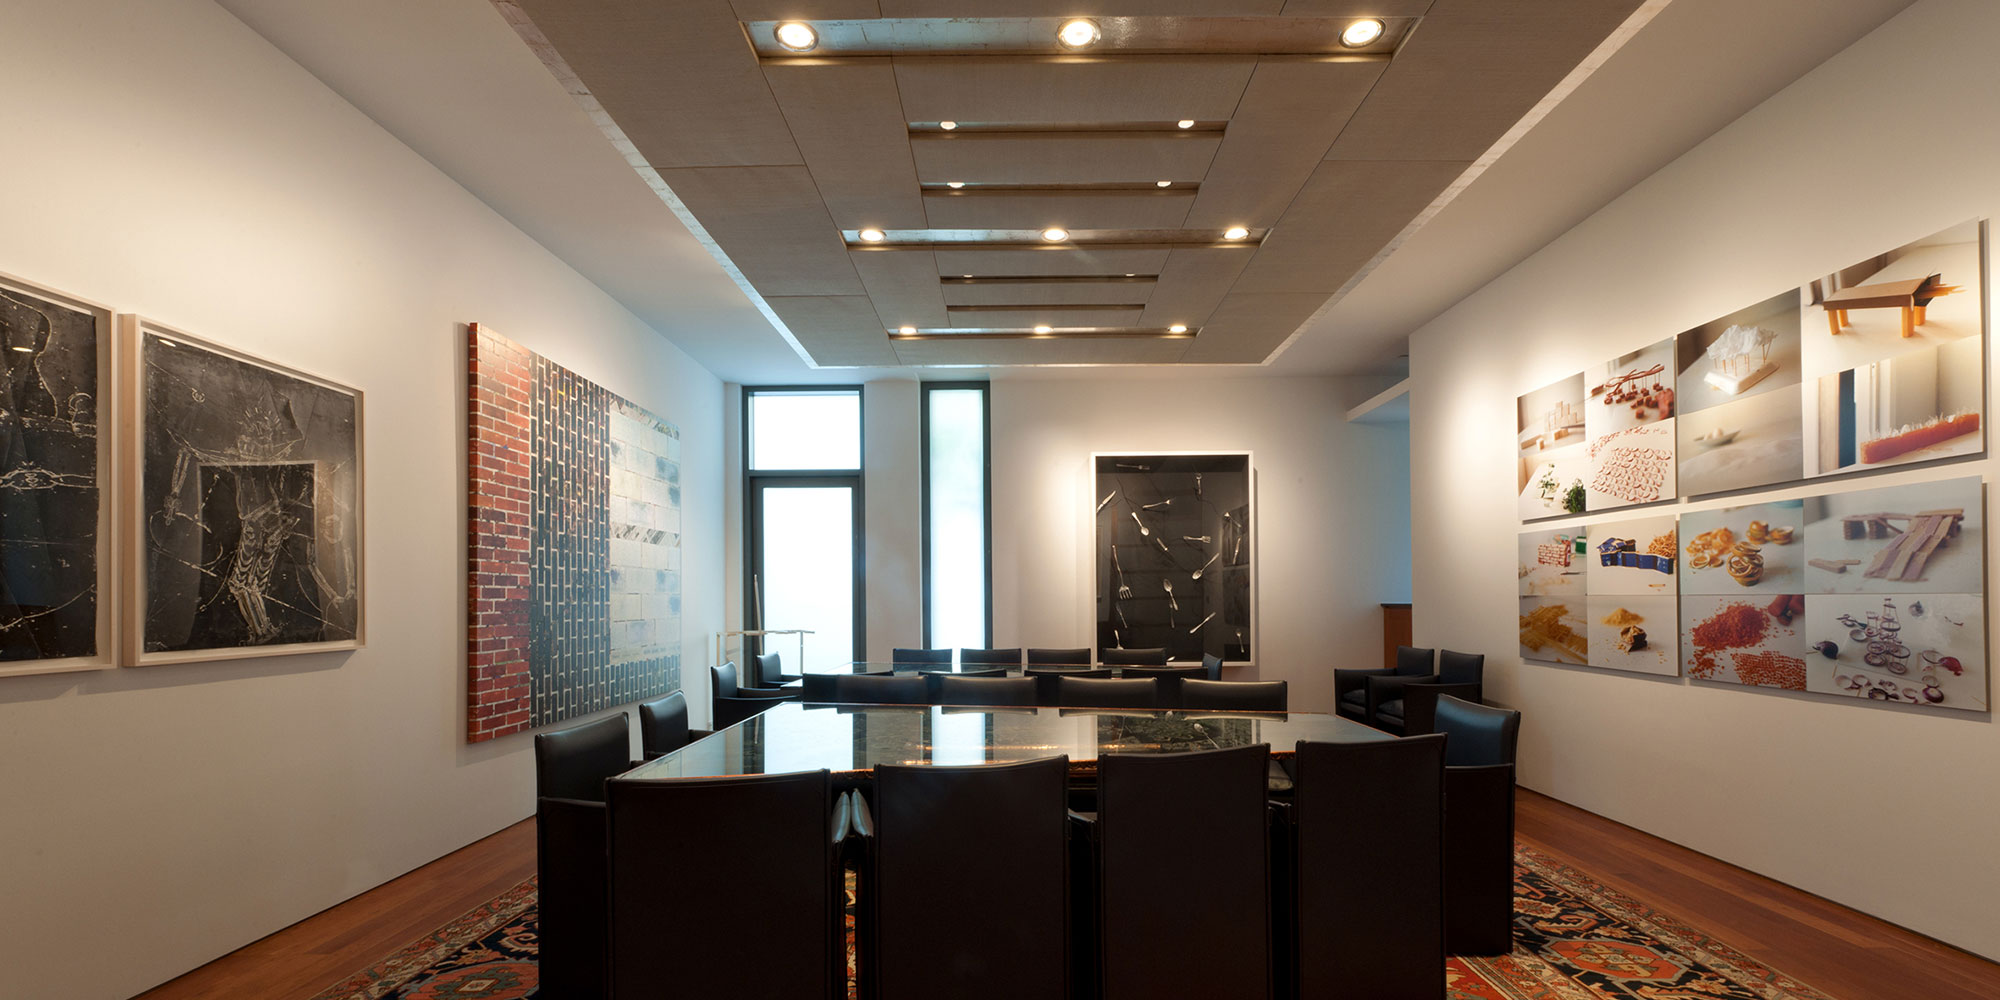 Dining Room, gallery